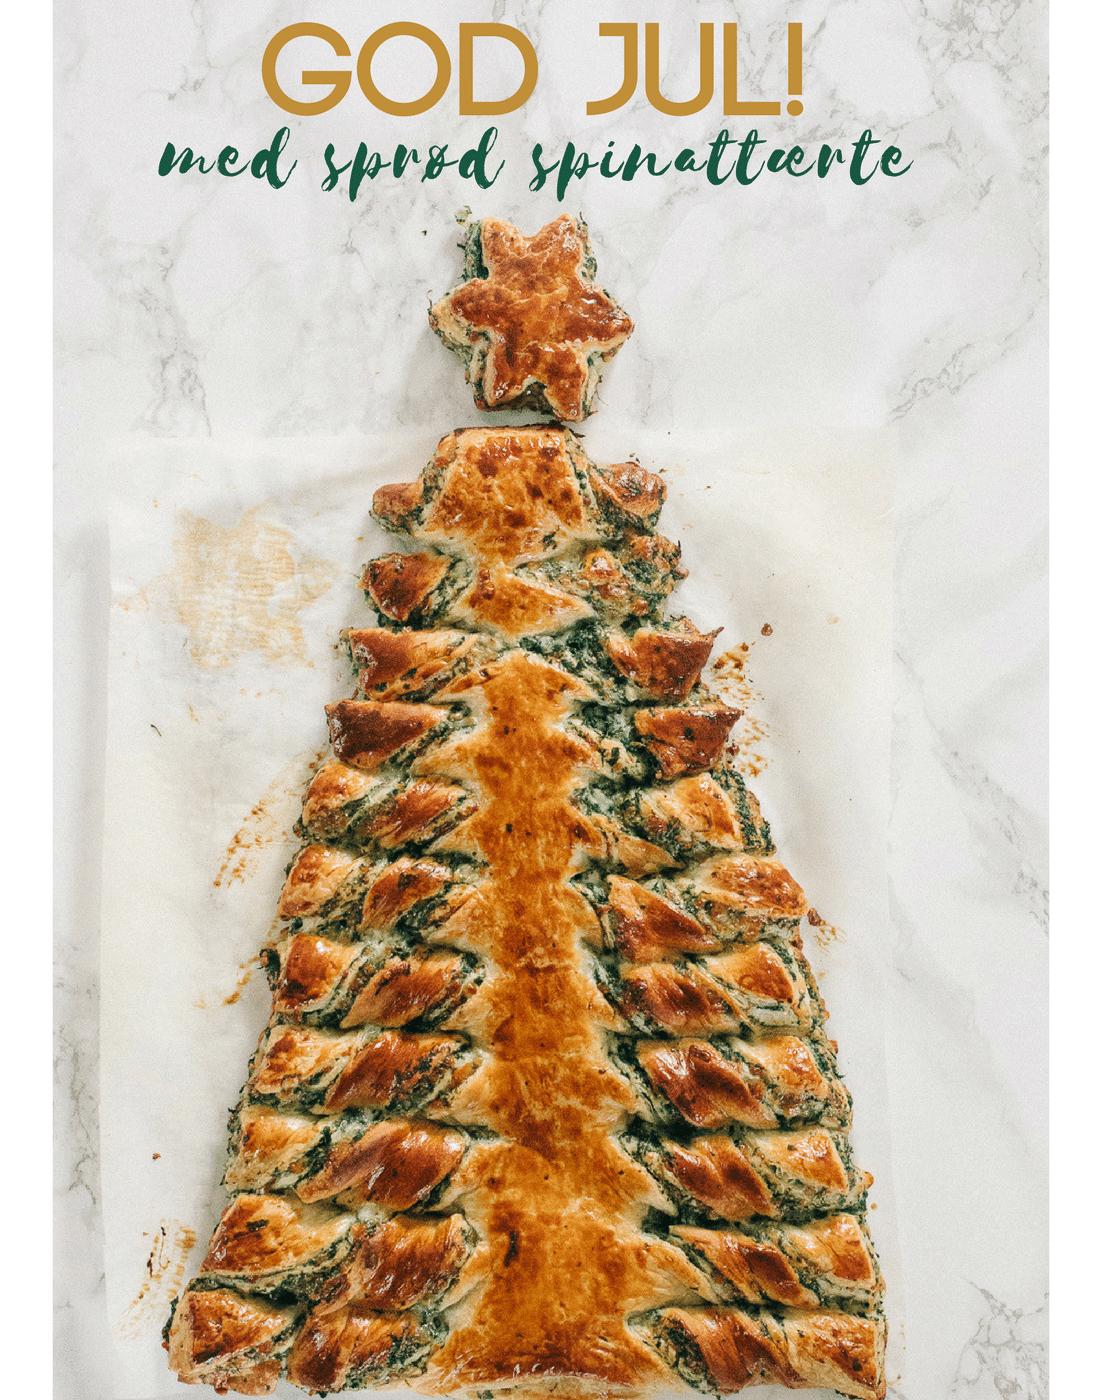 nem spinattærte, juleopskrifter, juletræ, jul